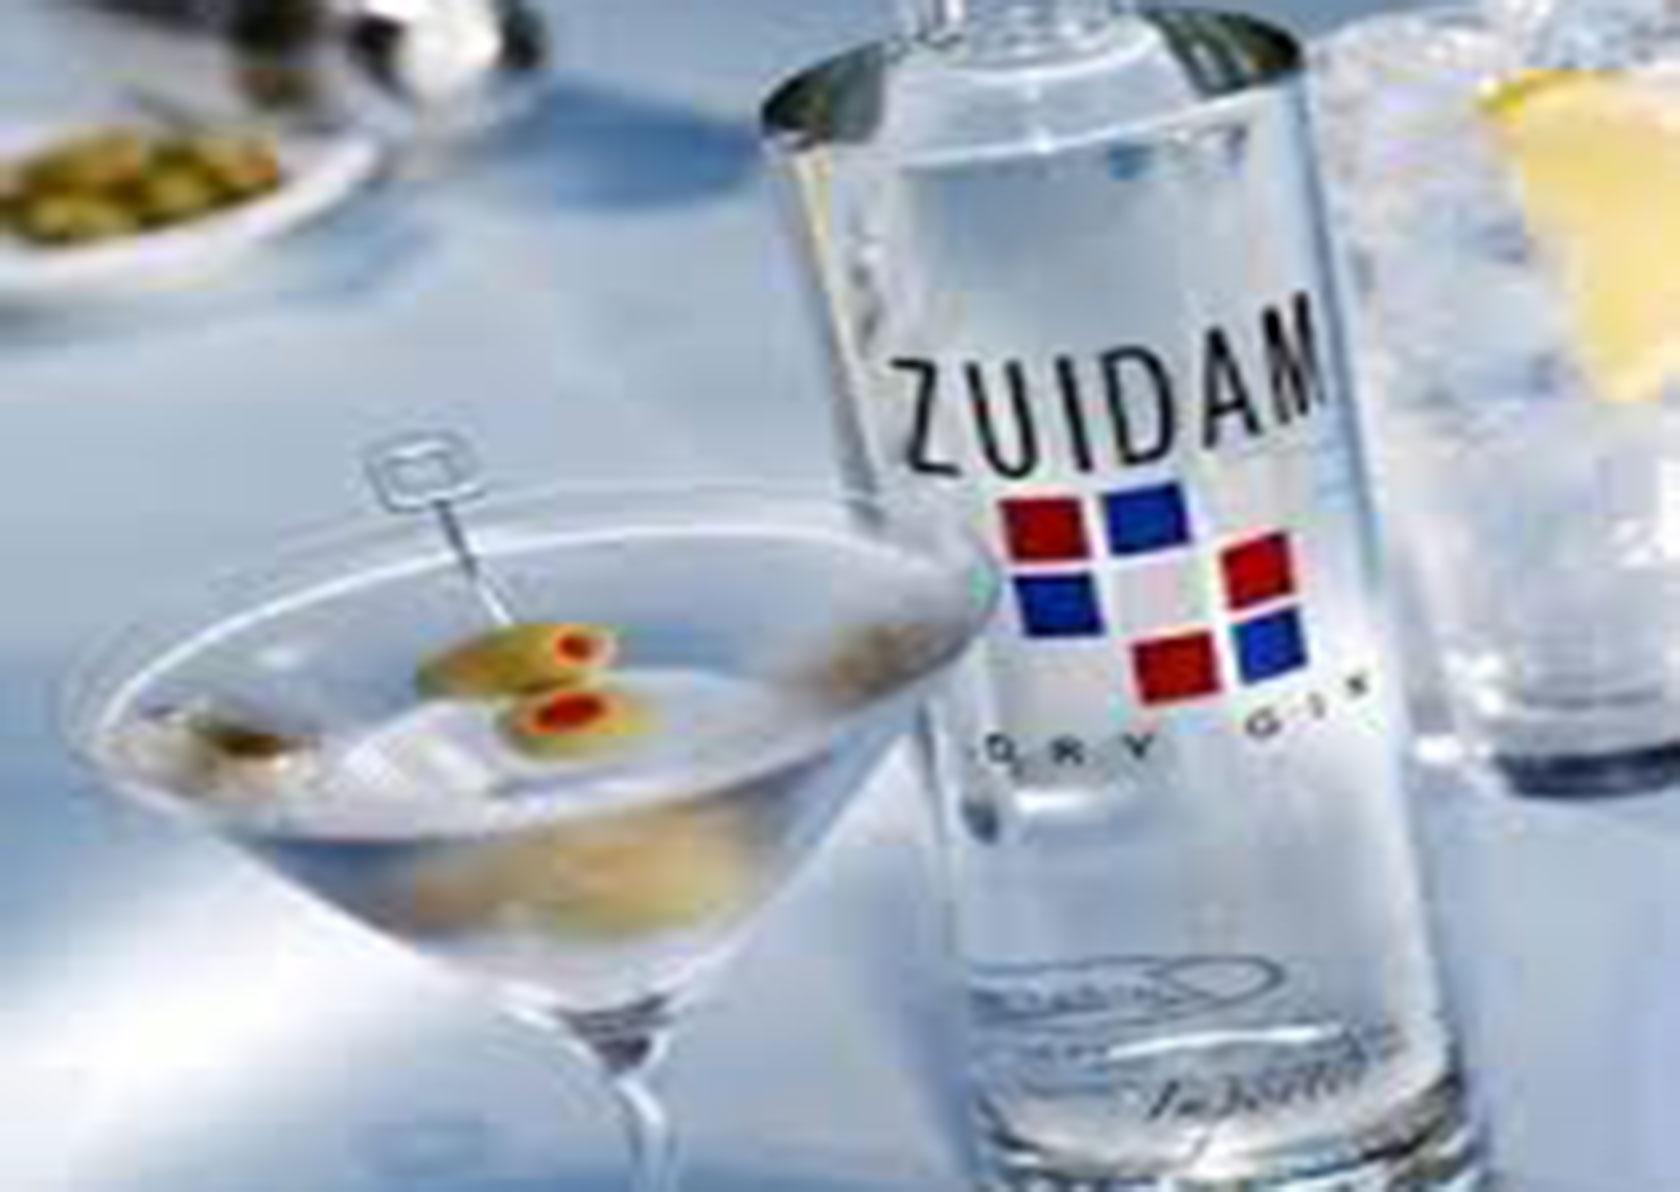 Zuidam Gin